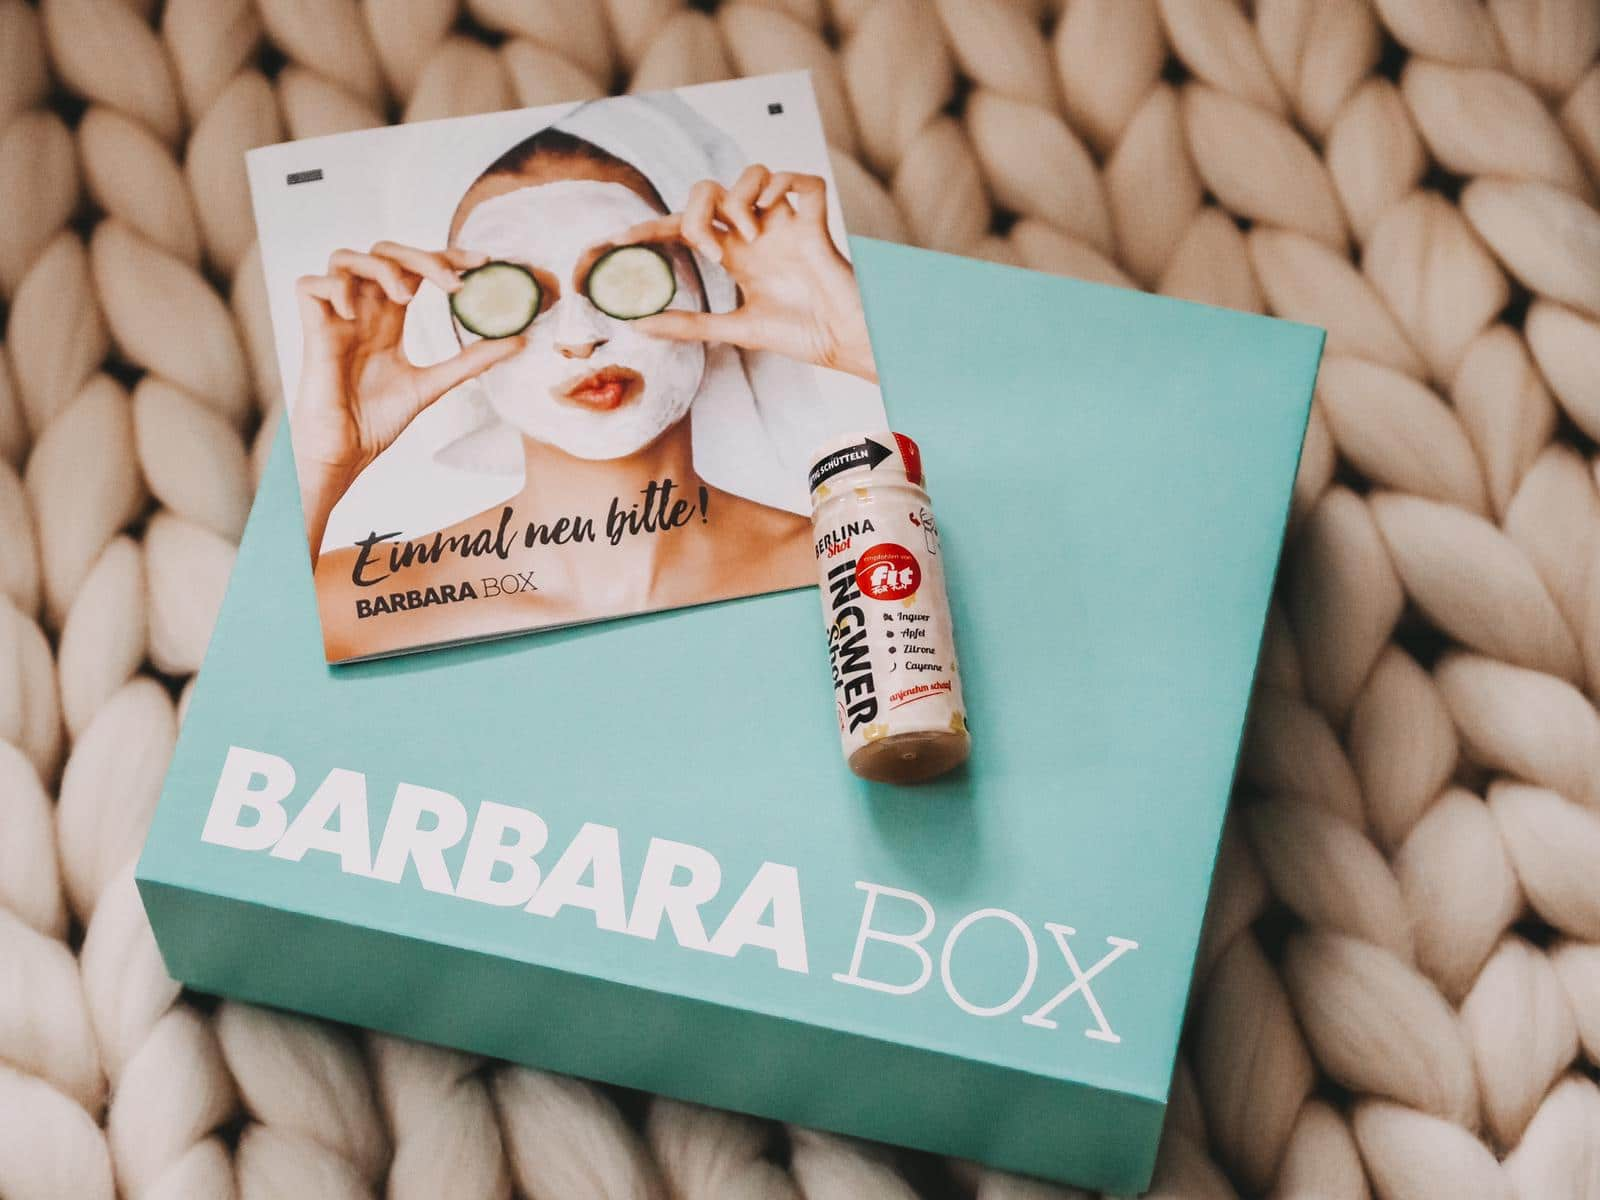 Ingwer Shot aus der Barbara Box Einmal neu bitte